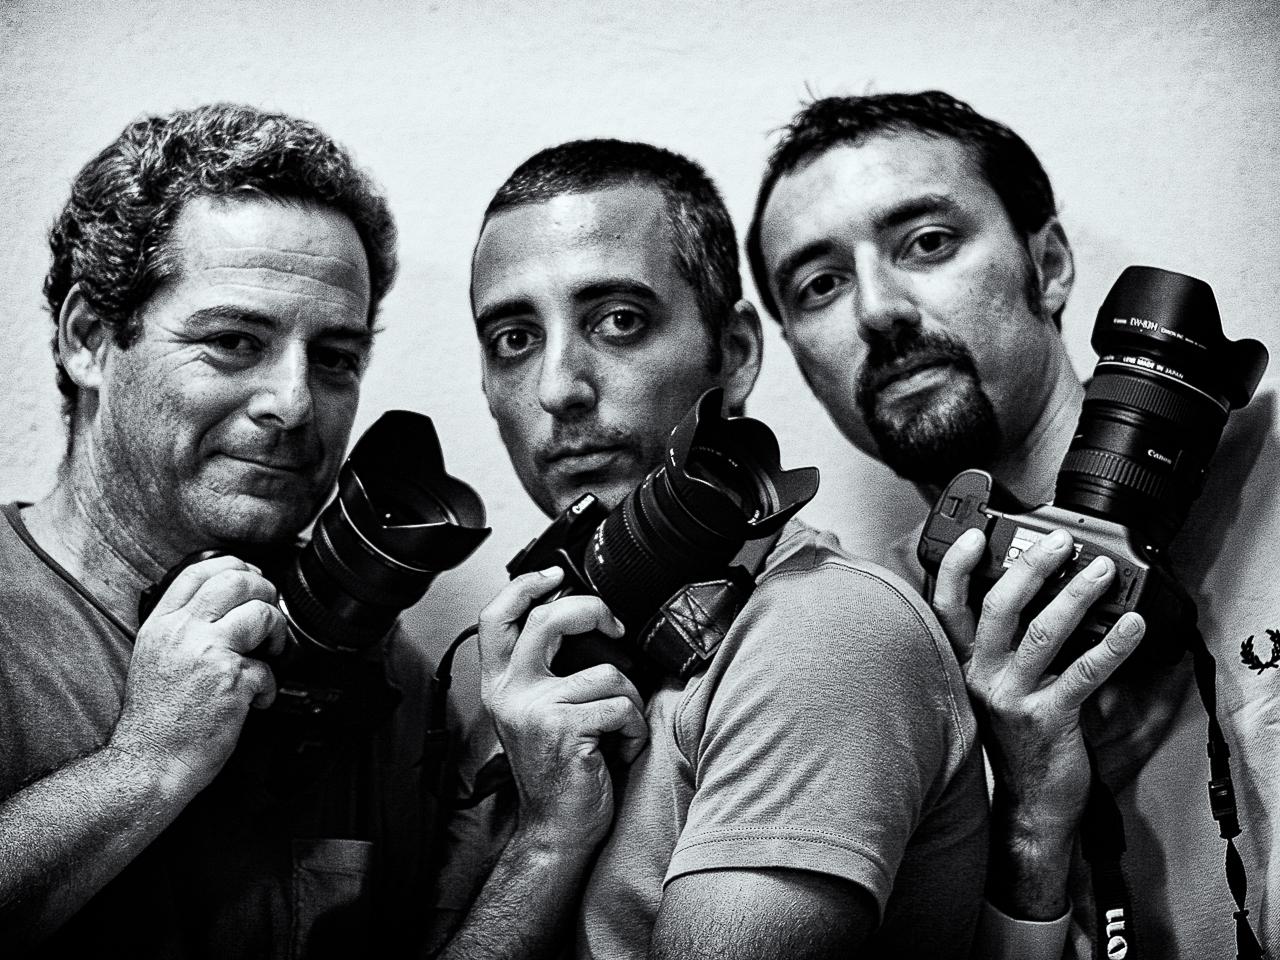 PhotoWalk #0.0